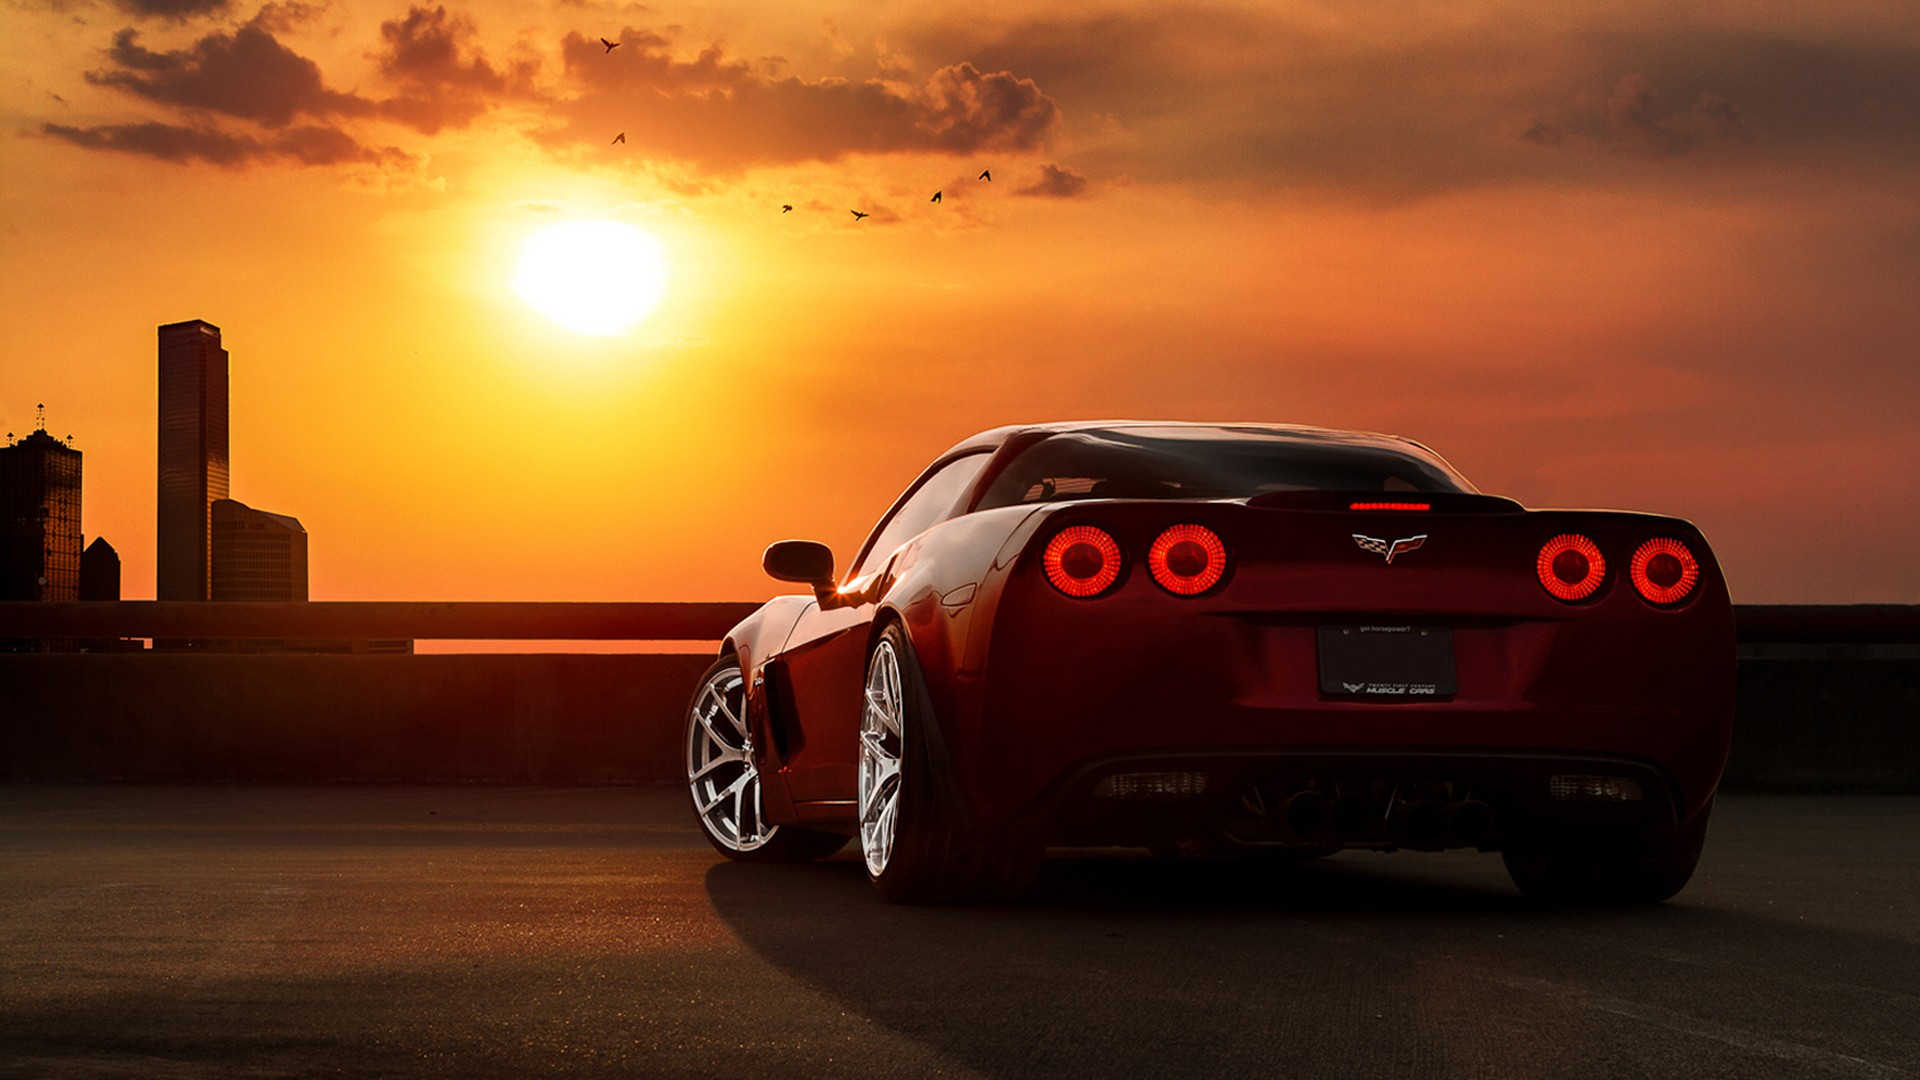 corvette wallpaper 1 Cool Backgrounds